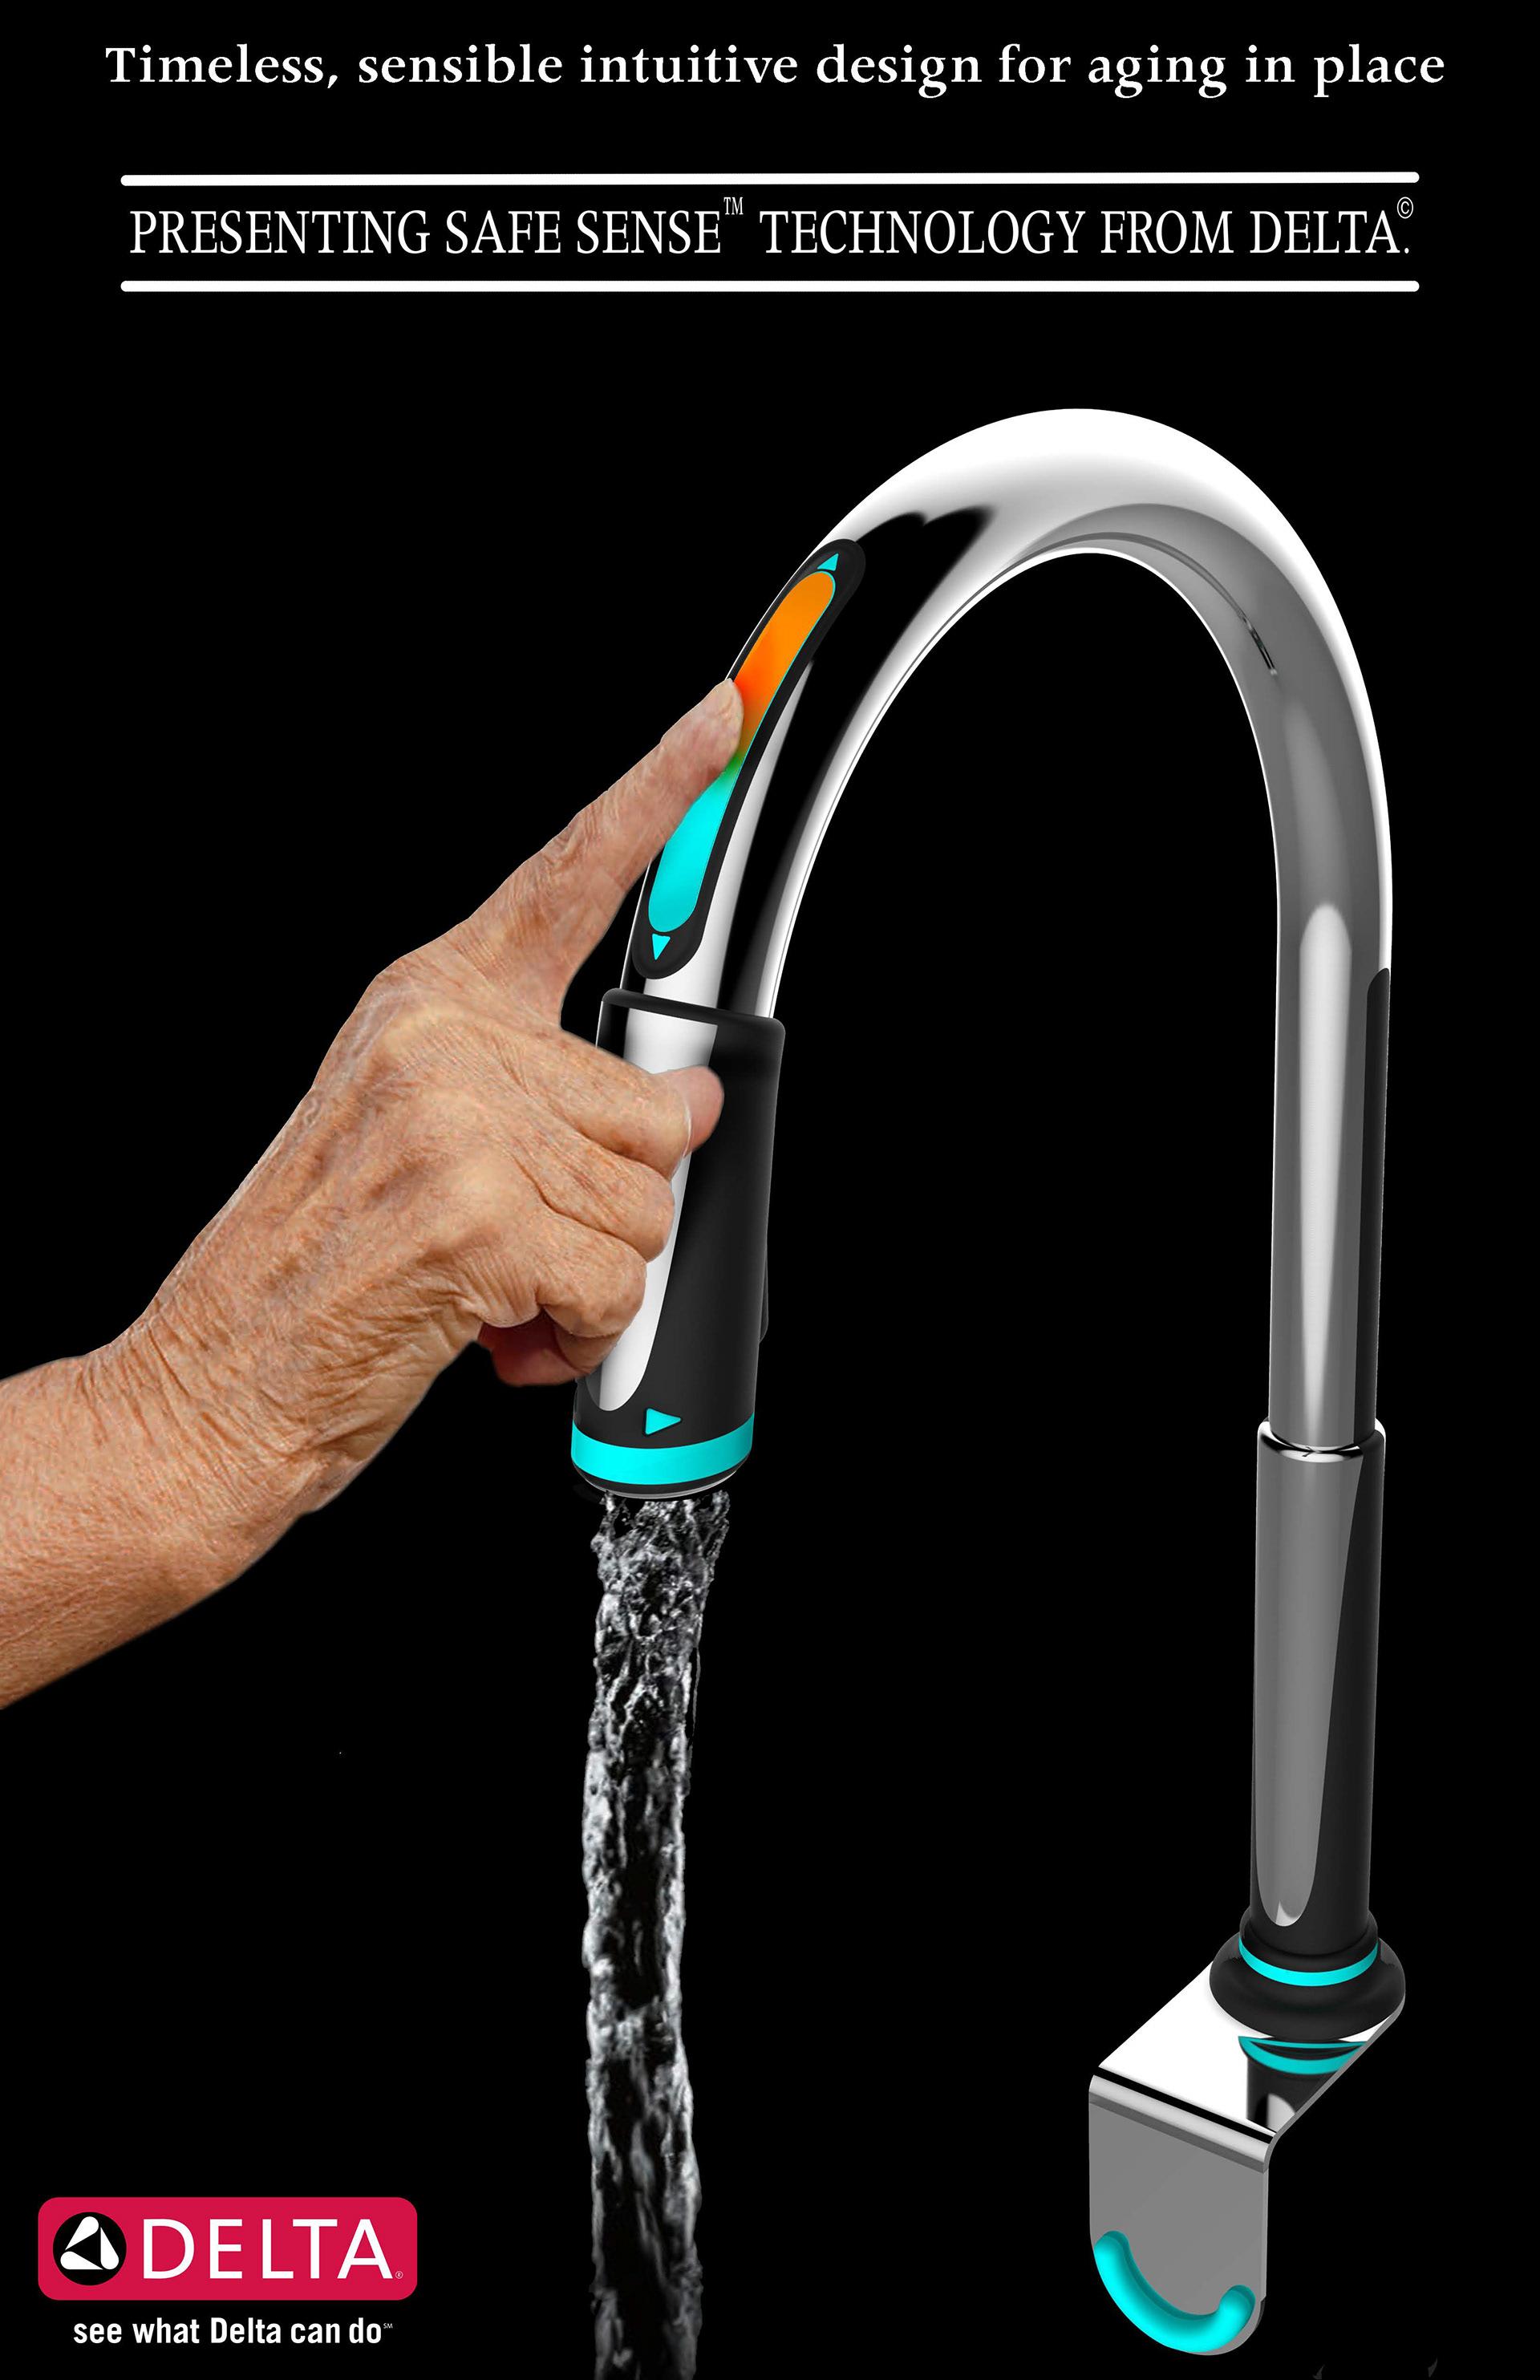 Sarah Gustafson - Delta Faucet Competition